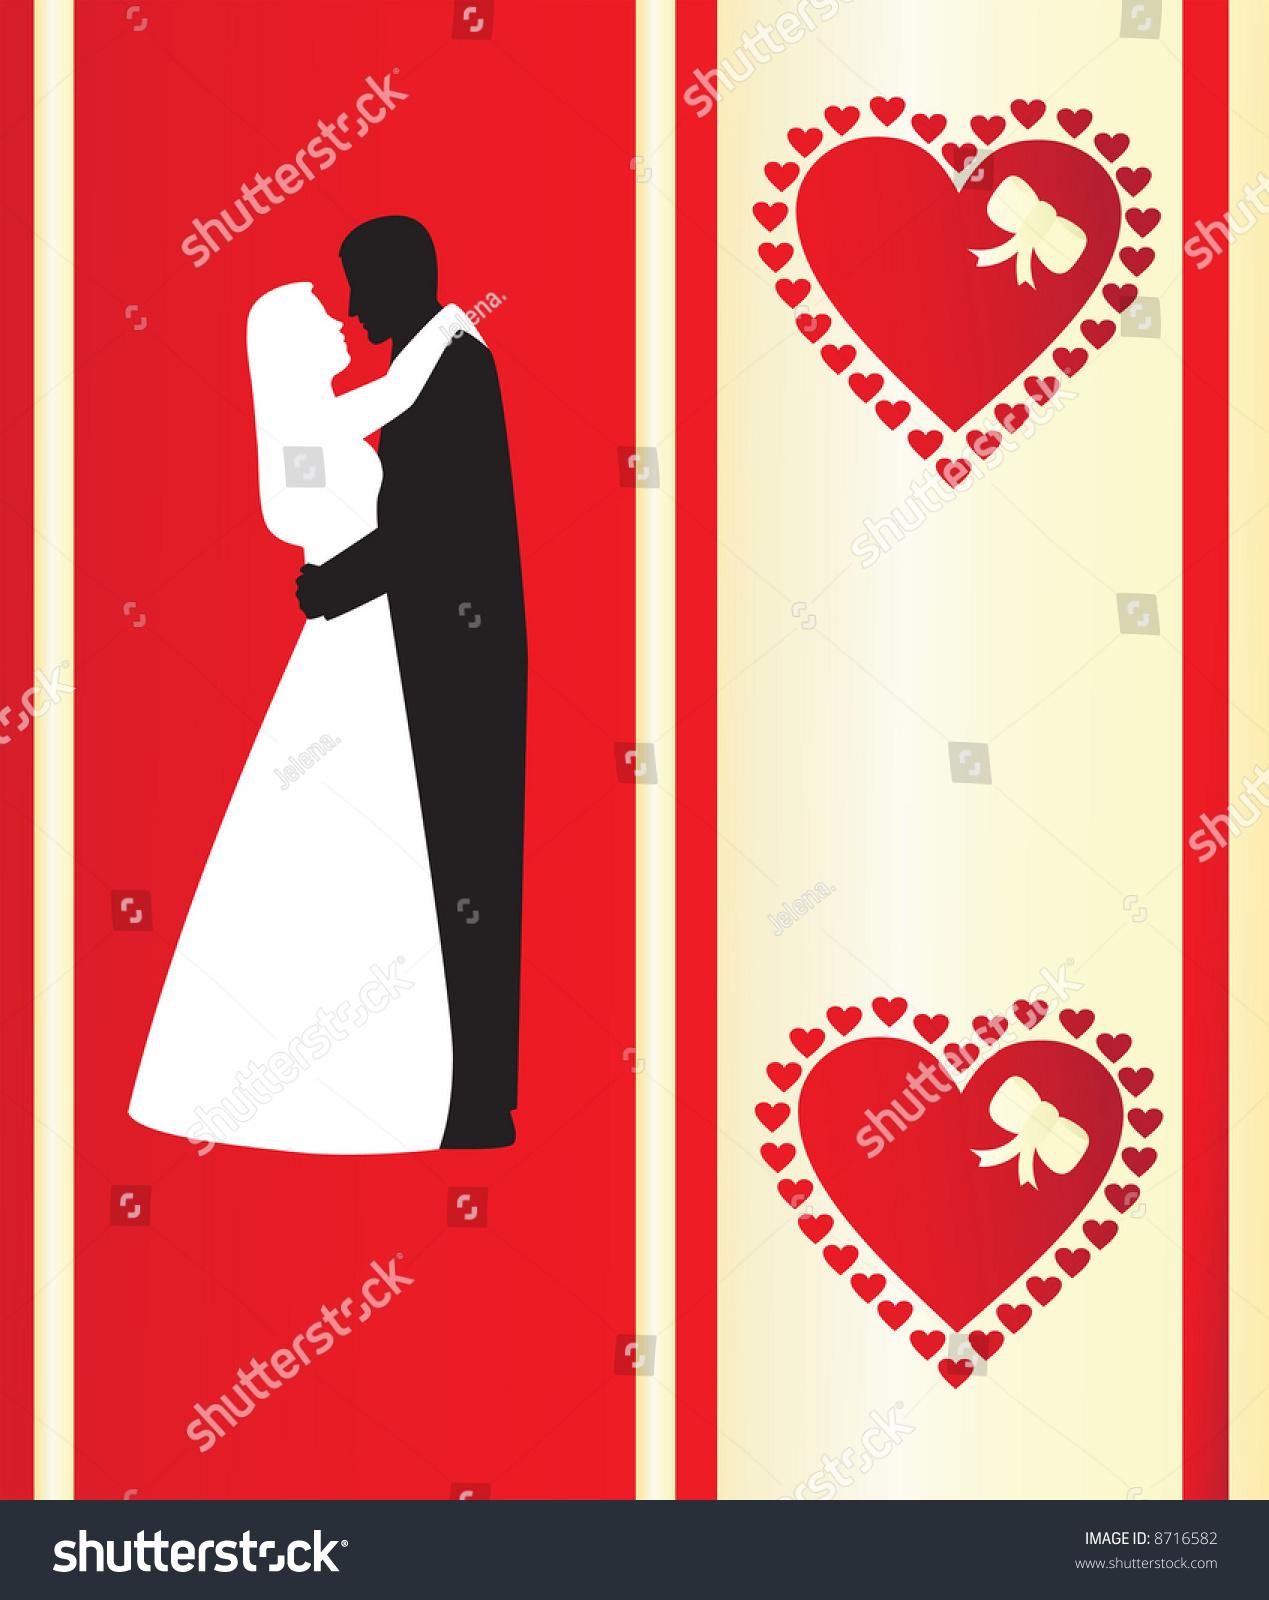 Silhouettes Wedding Couple Romantic Background Wedding Stock Vector ...